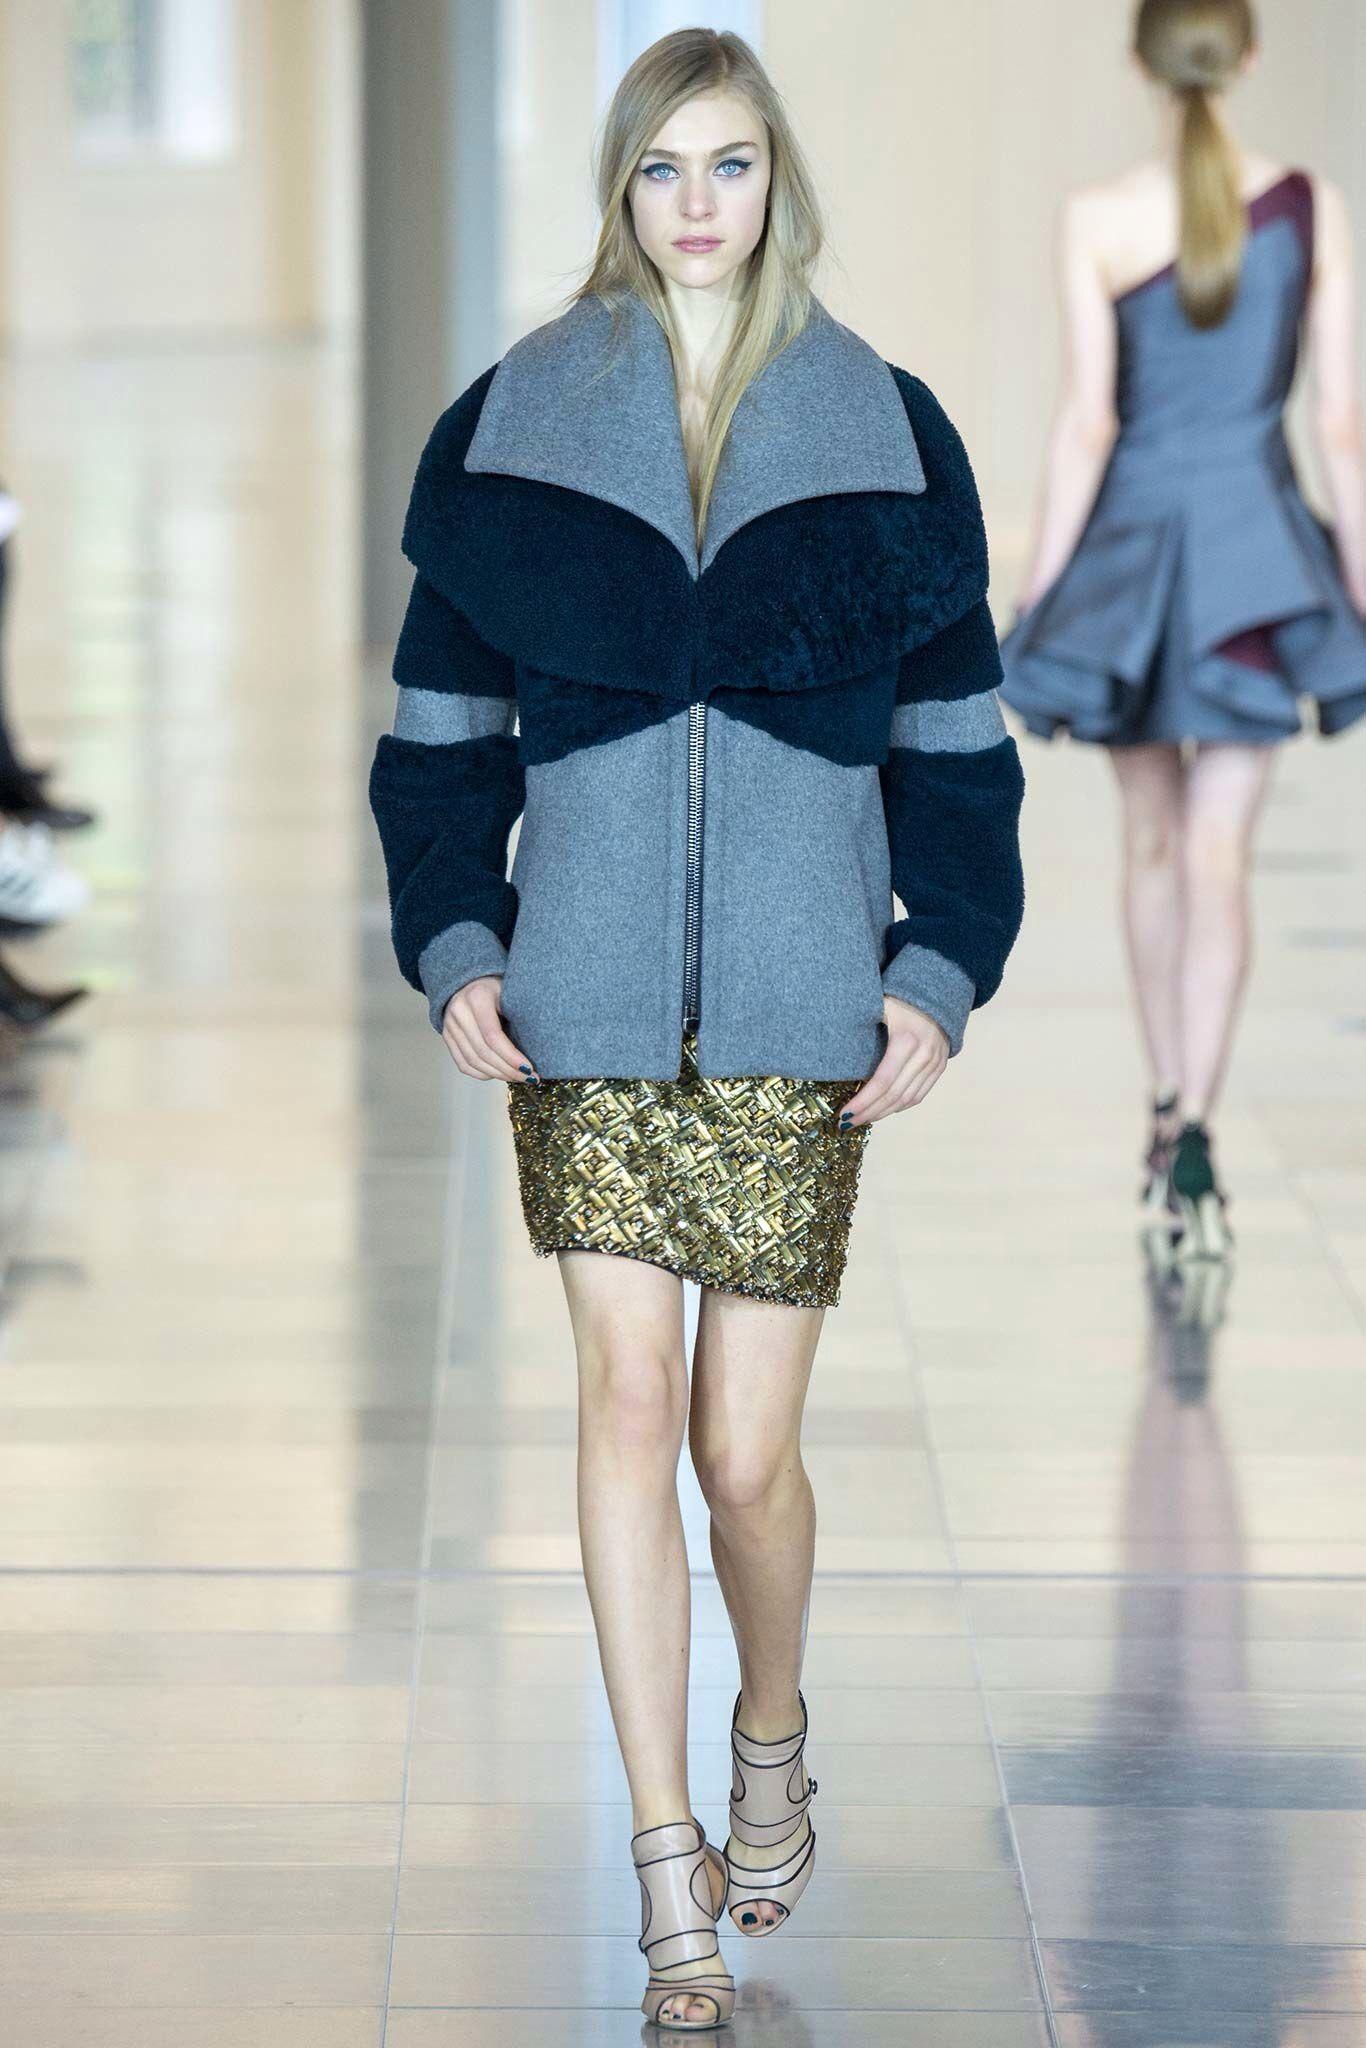 Antonio Berardi Fall 2015 Ready-to-Wear Fashion Show Collection